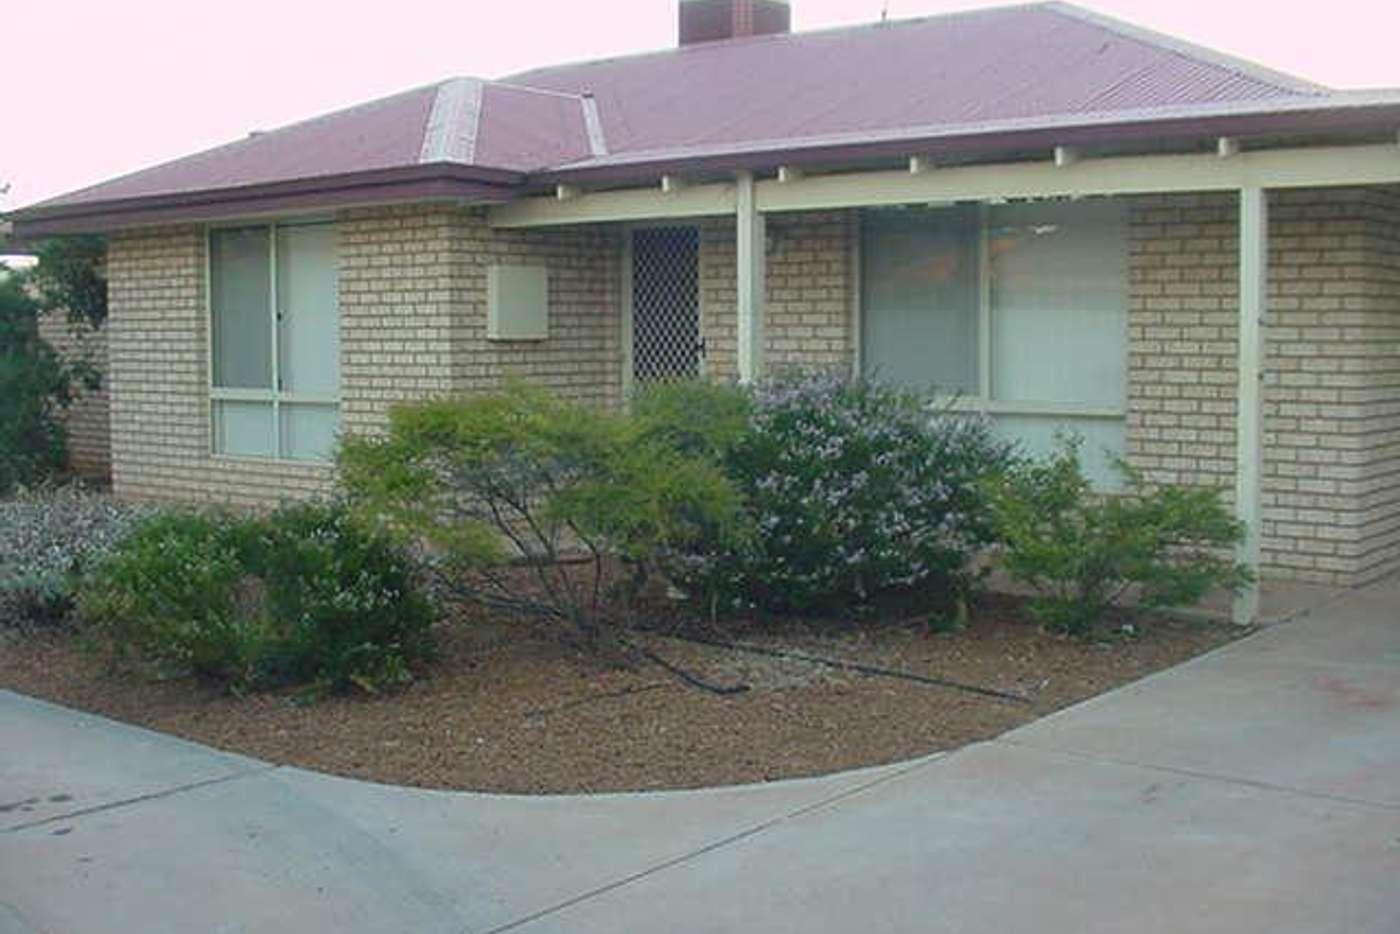 Main view of Homely house listing, 420A Egan Street, Kalgoorlie WA 6430